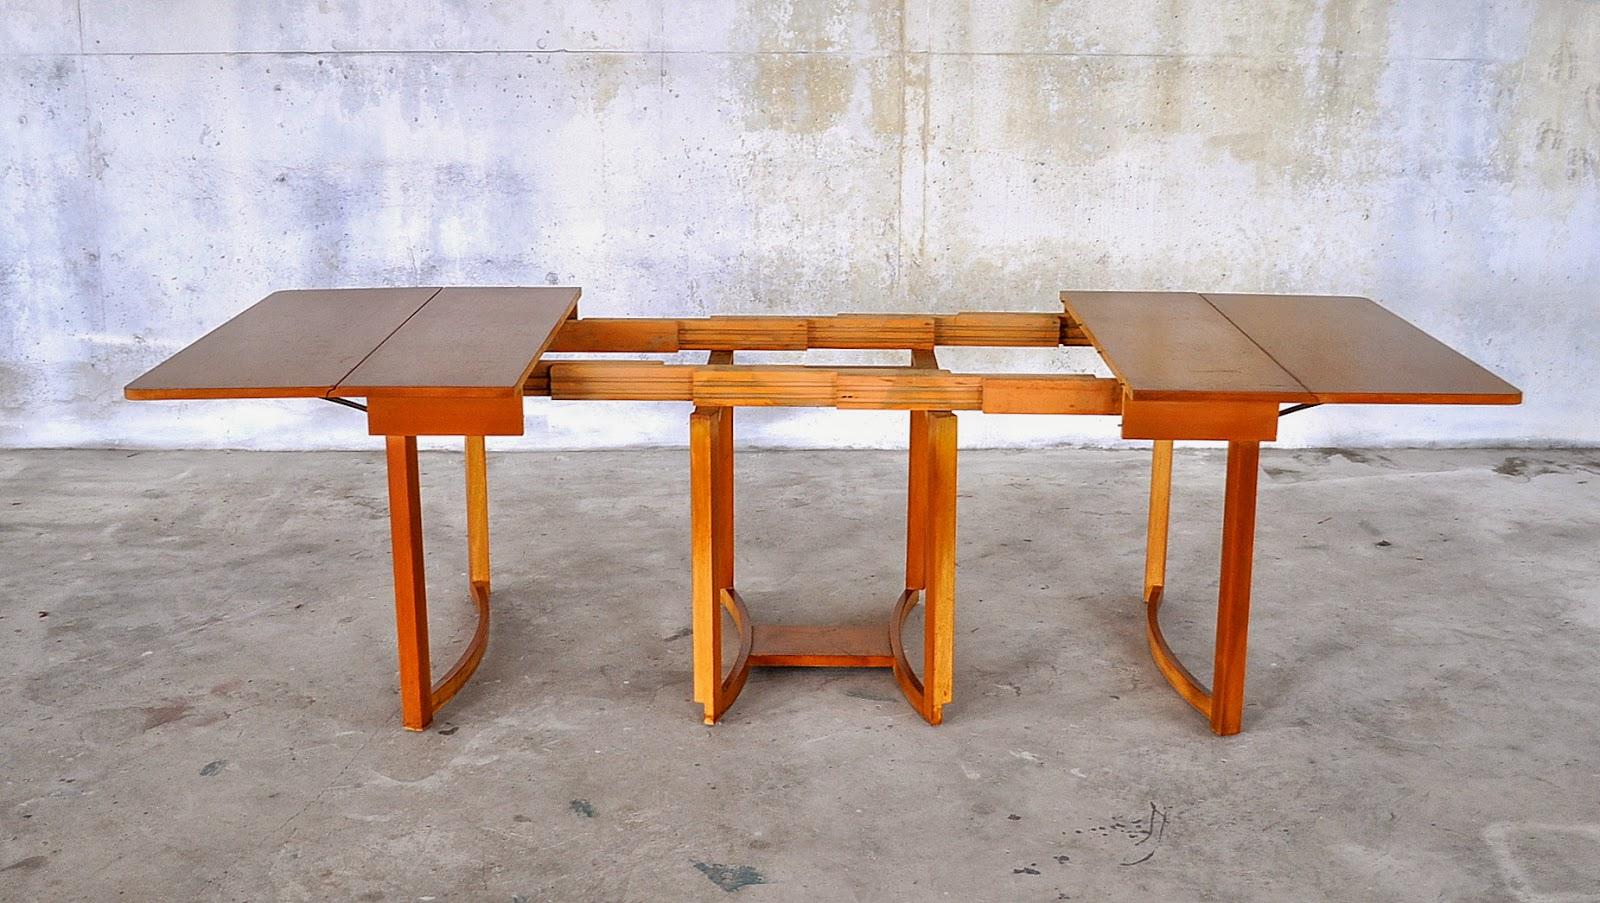 Designed By TH Robsjohn Gibbins 1950s Manufactured Widdicomb Furniture